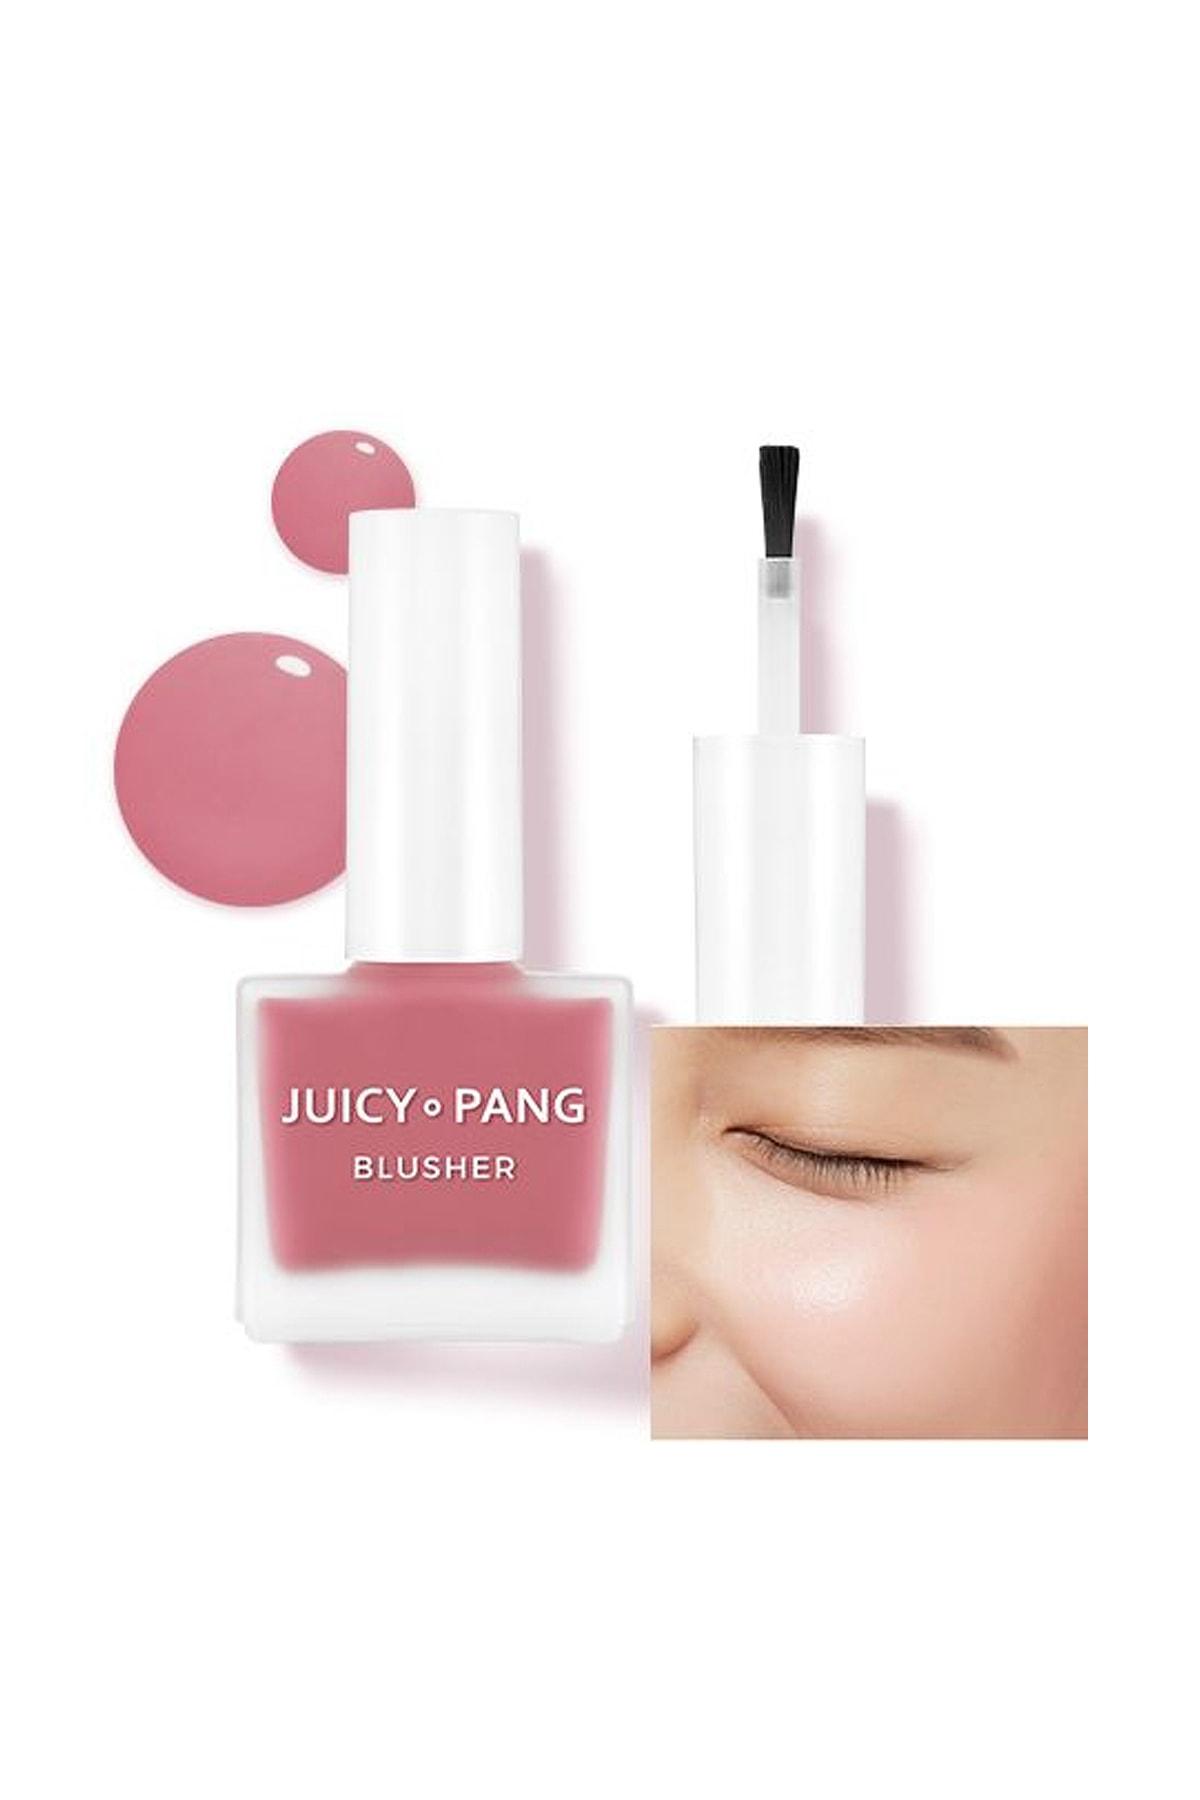 Missha Doğal Görünüm Sunan Nemlendirici Likit Allık 9g. APIEU Juicy-Pang Water Blusher (PK02)